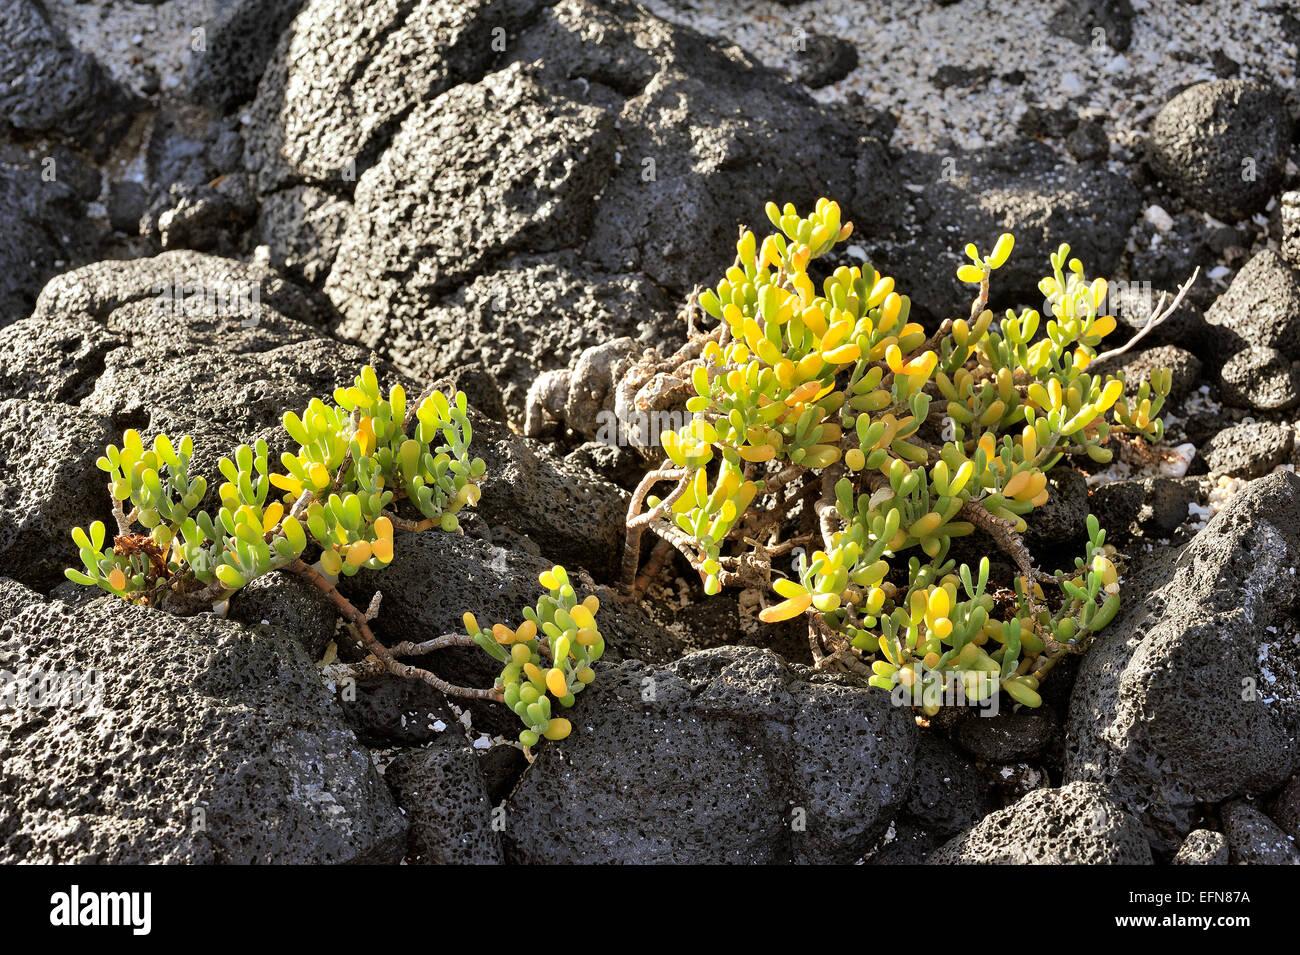 flora of Lanzarote Island - Zygophyllum fontanesii, Canary Islands, Spain - Stock Image